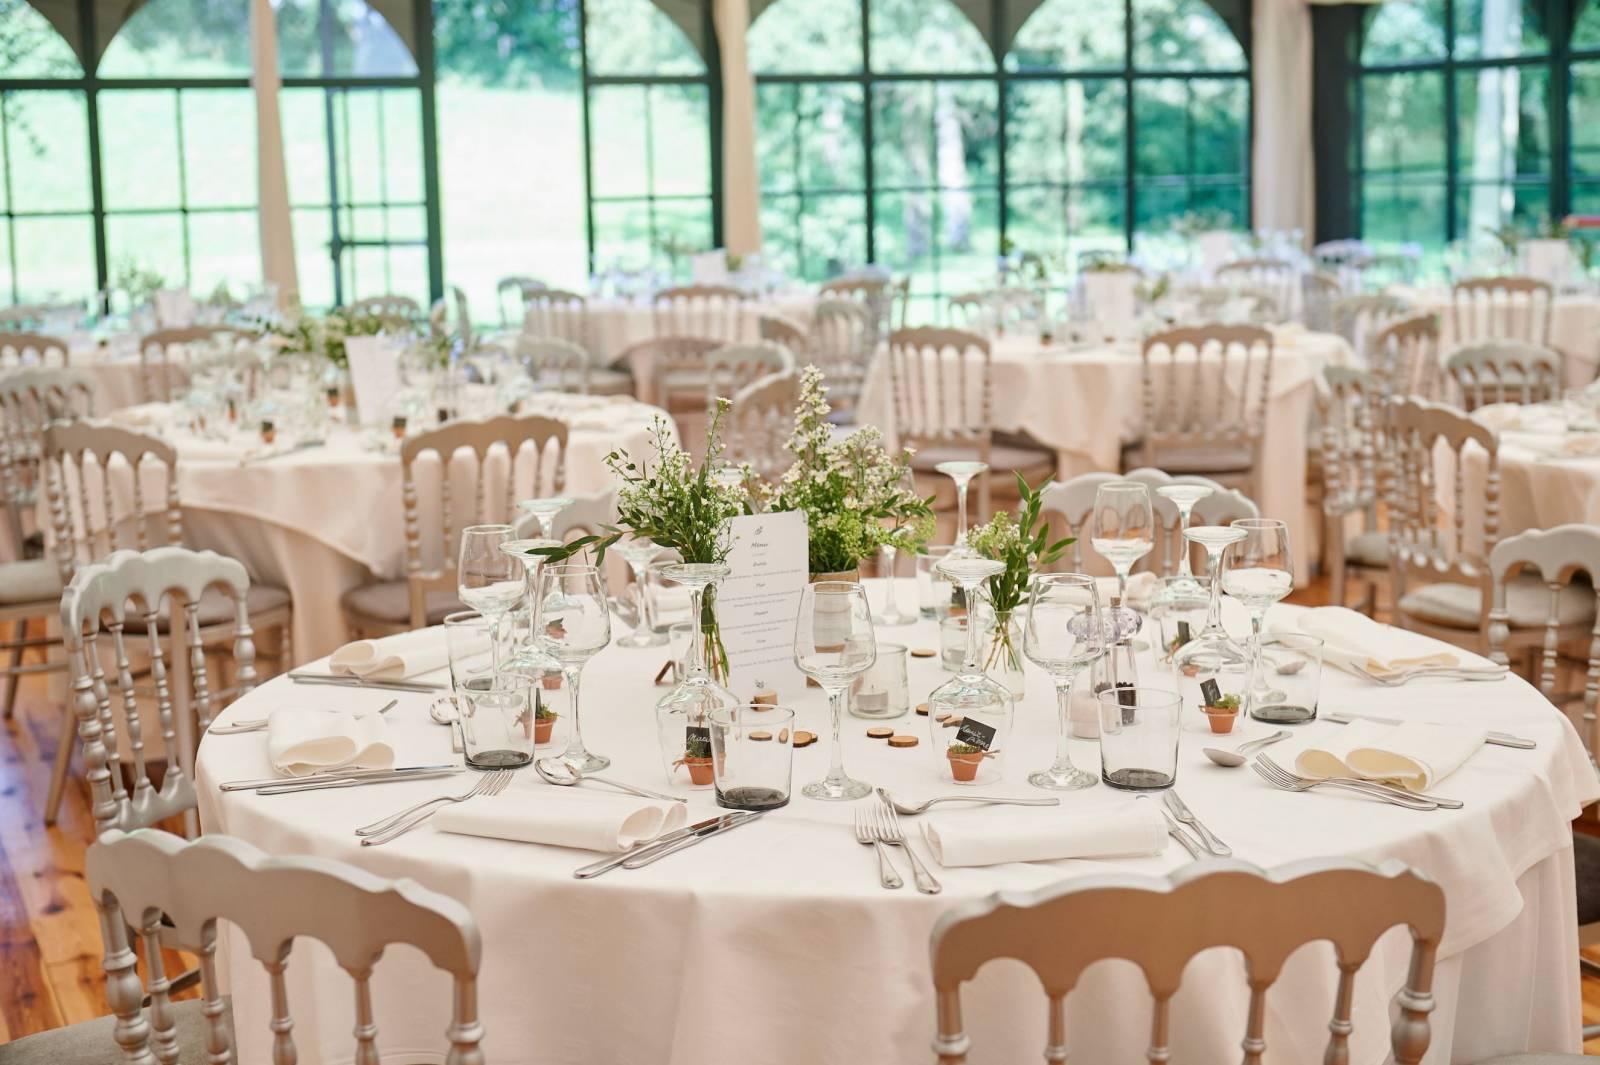 La ferme de coquiamont- venue - House of Weddings - 1